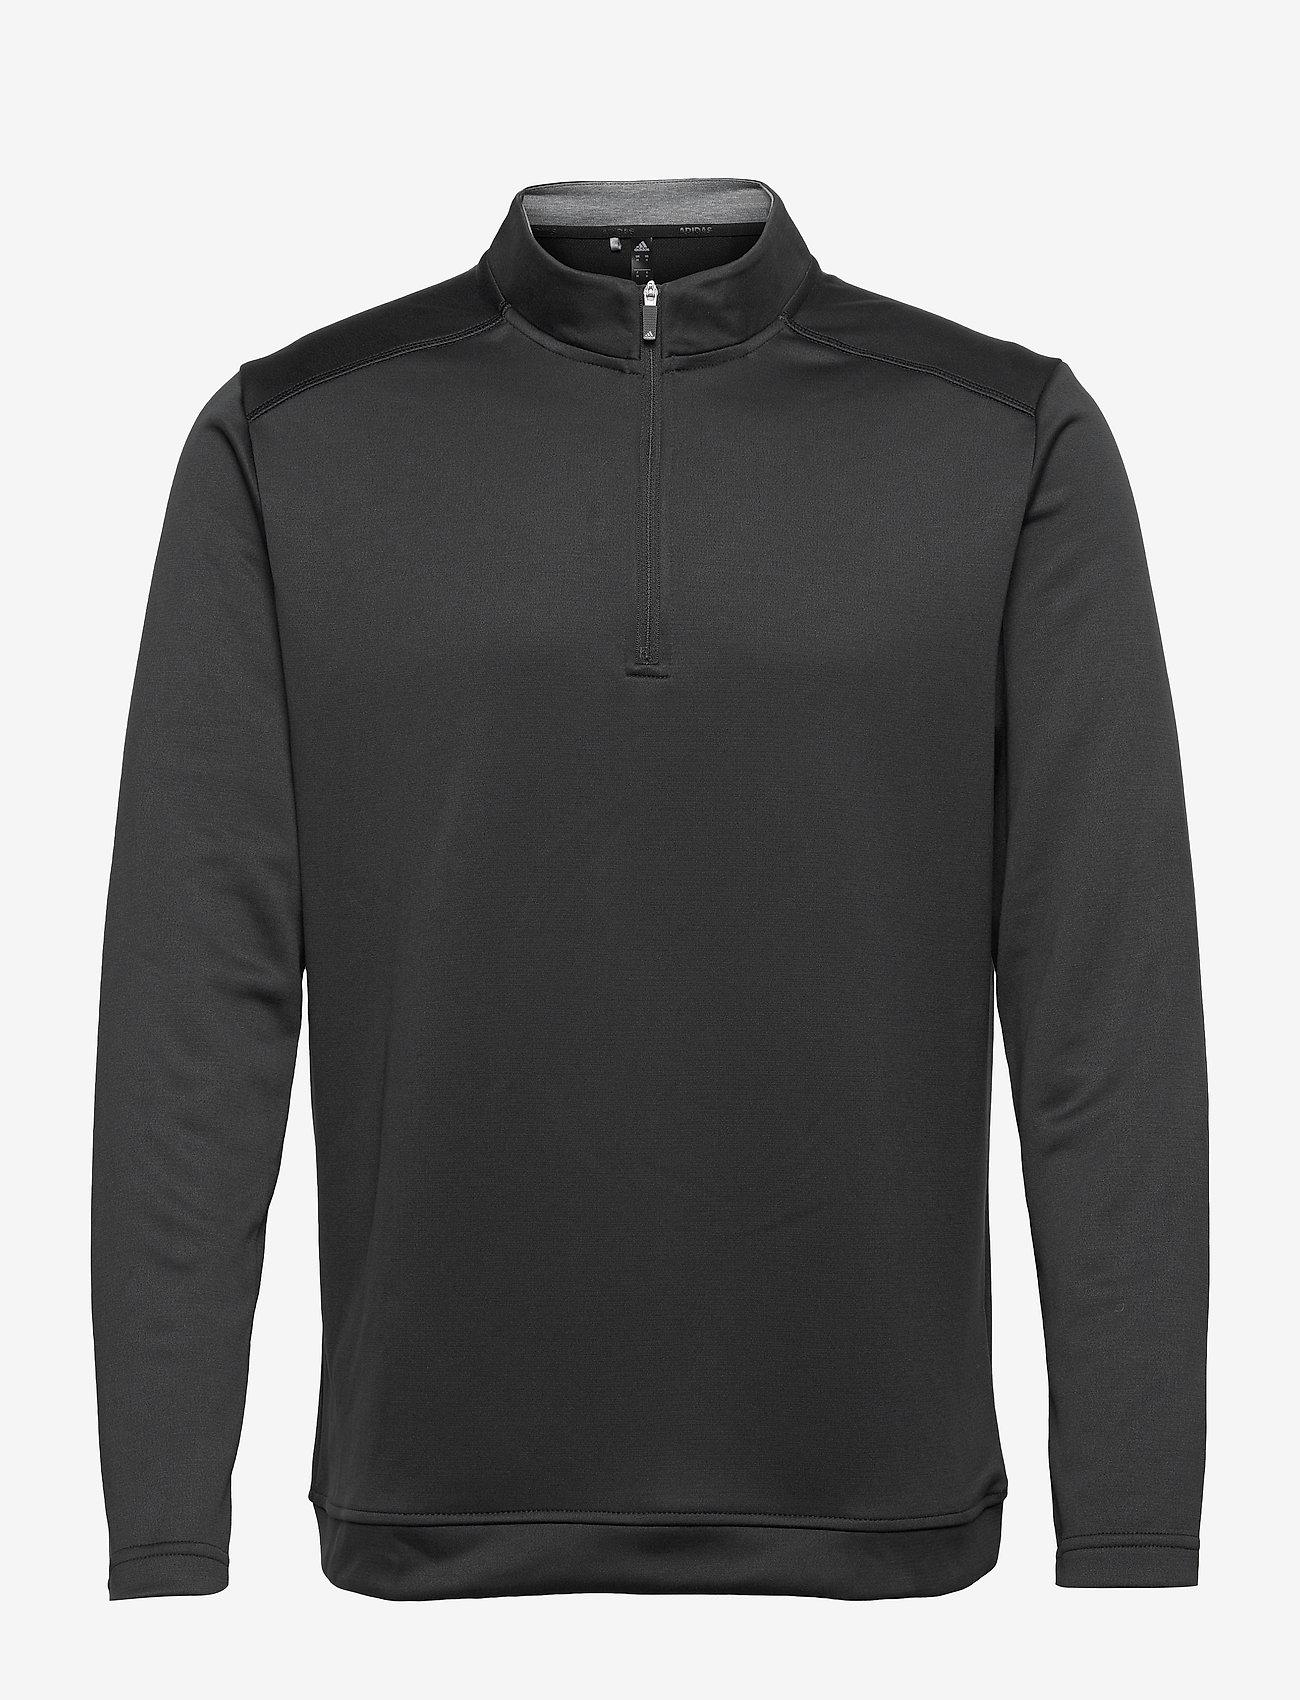 adidas Golf - CLUB 1/4 ZIP - hauts à manches longues - black - 1